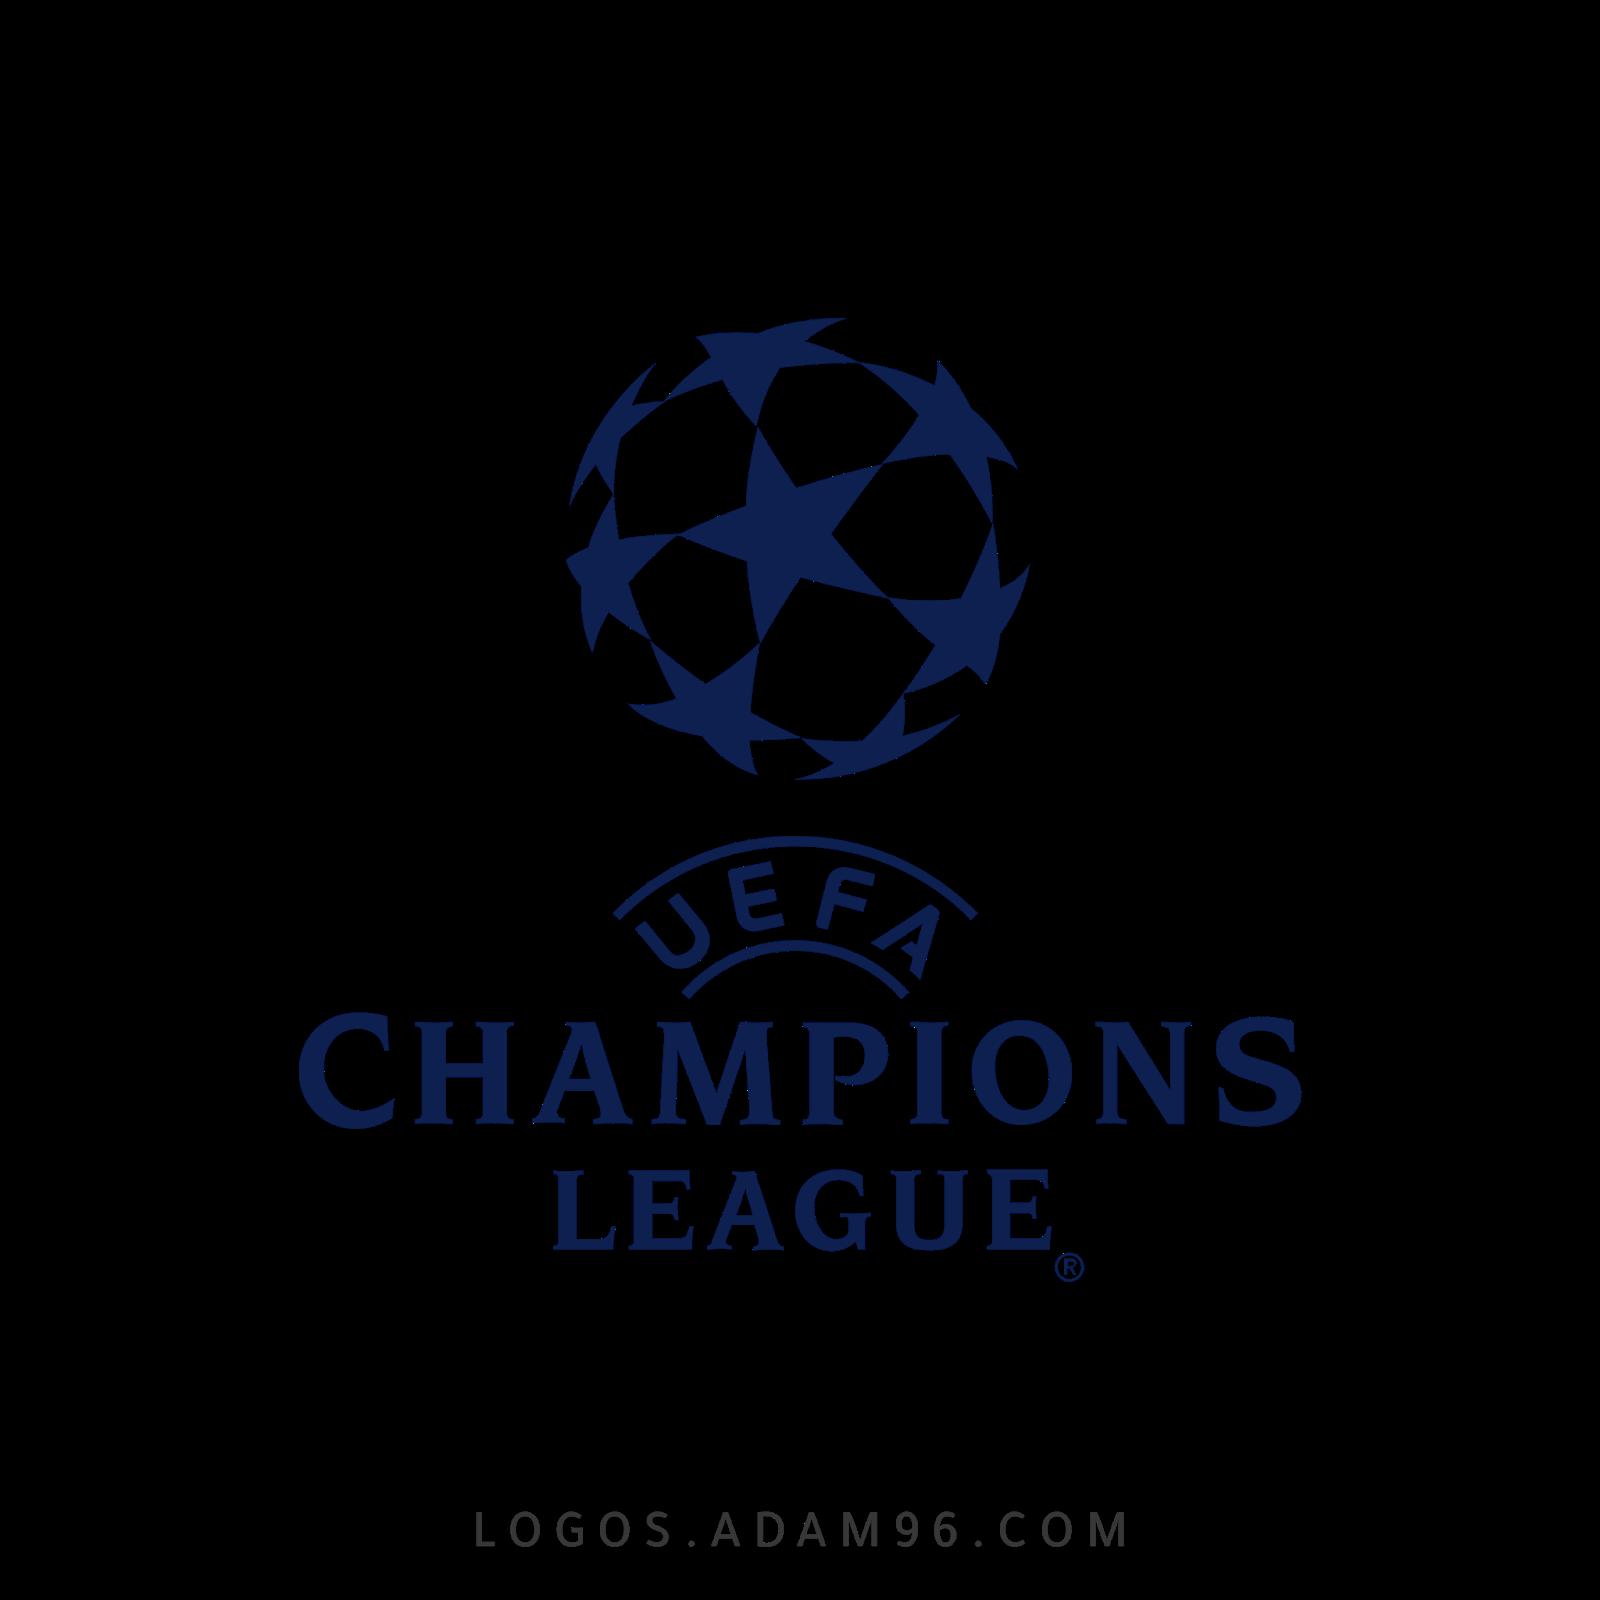 Uefa Champions League Logo Original Png Download Logo For Free Champions League Logo Logo Champions League Uefa Champions League